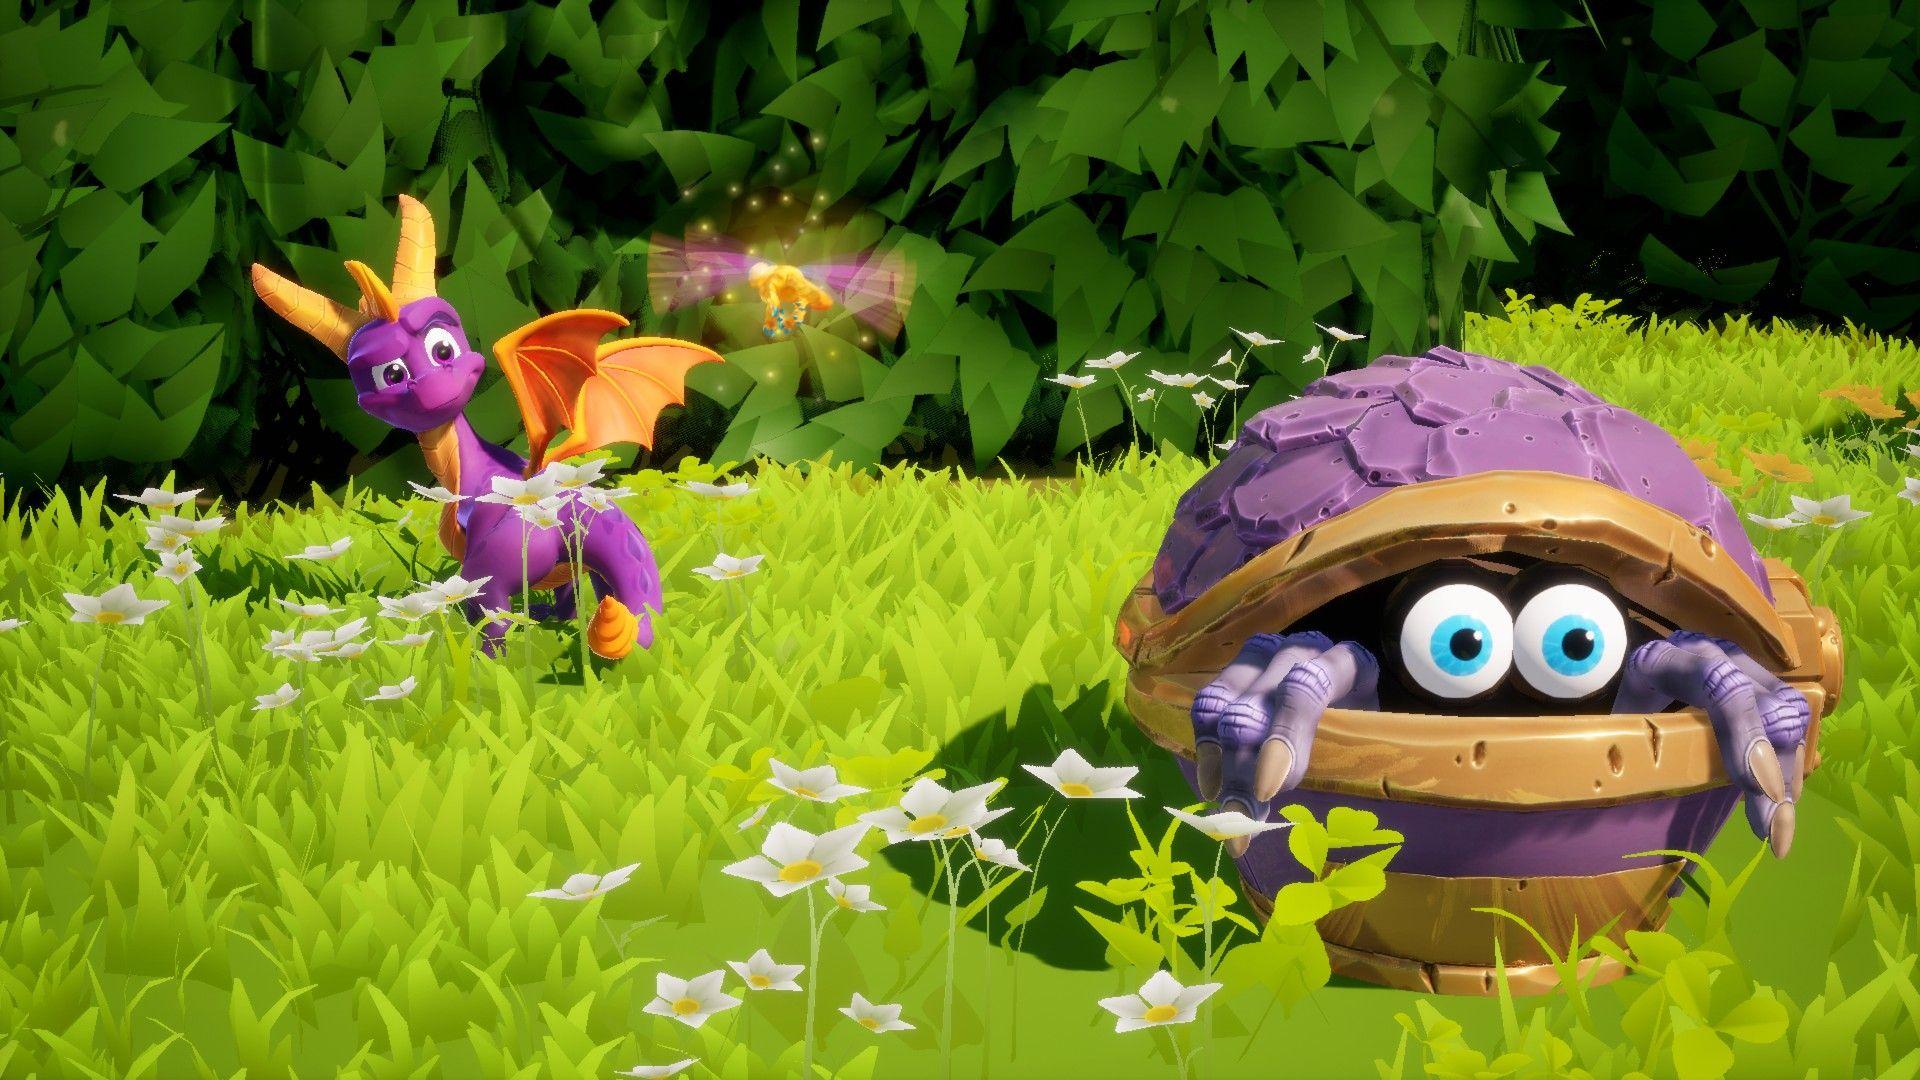 I don't blame you Spyro, that thing looks creepy  | Spyro